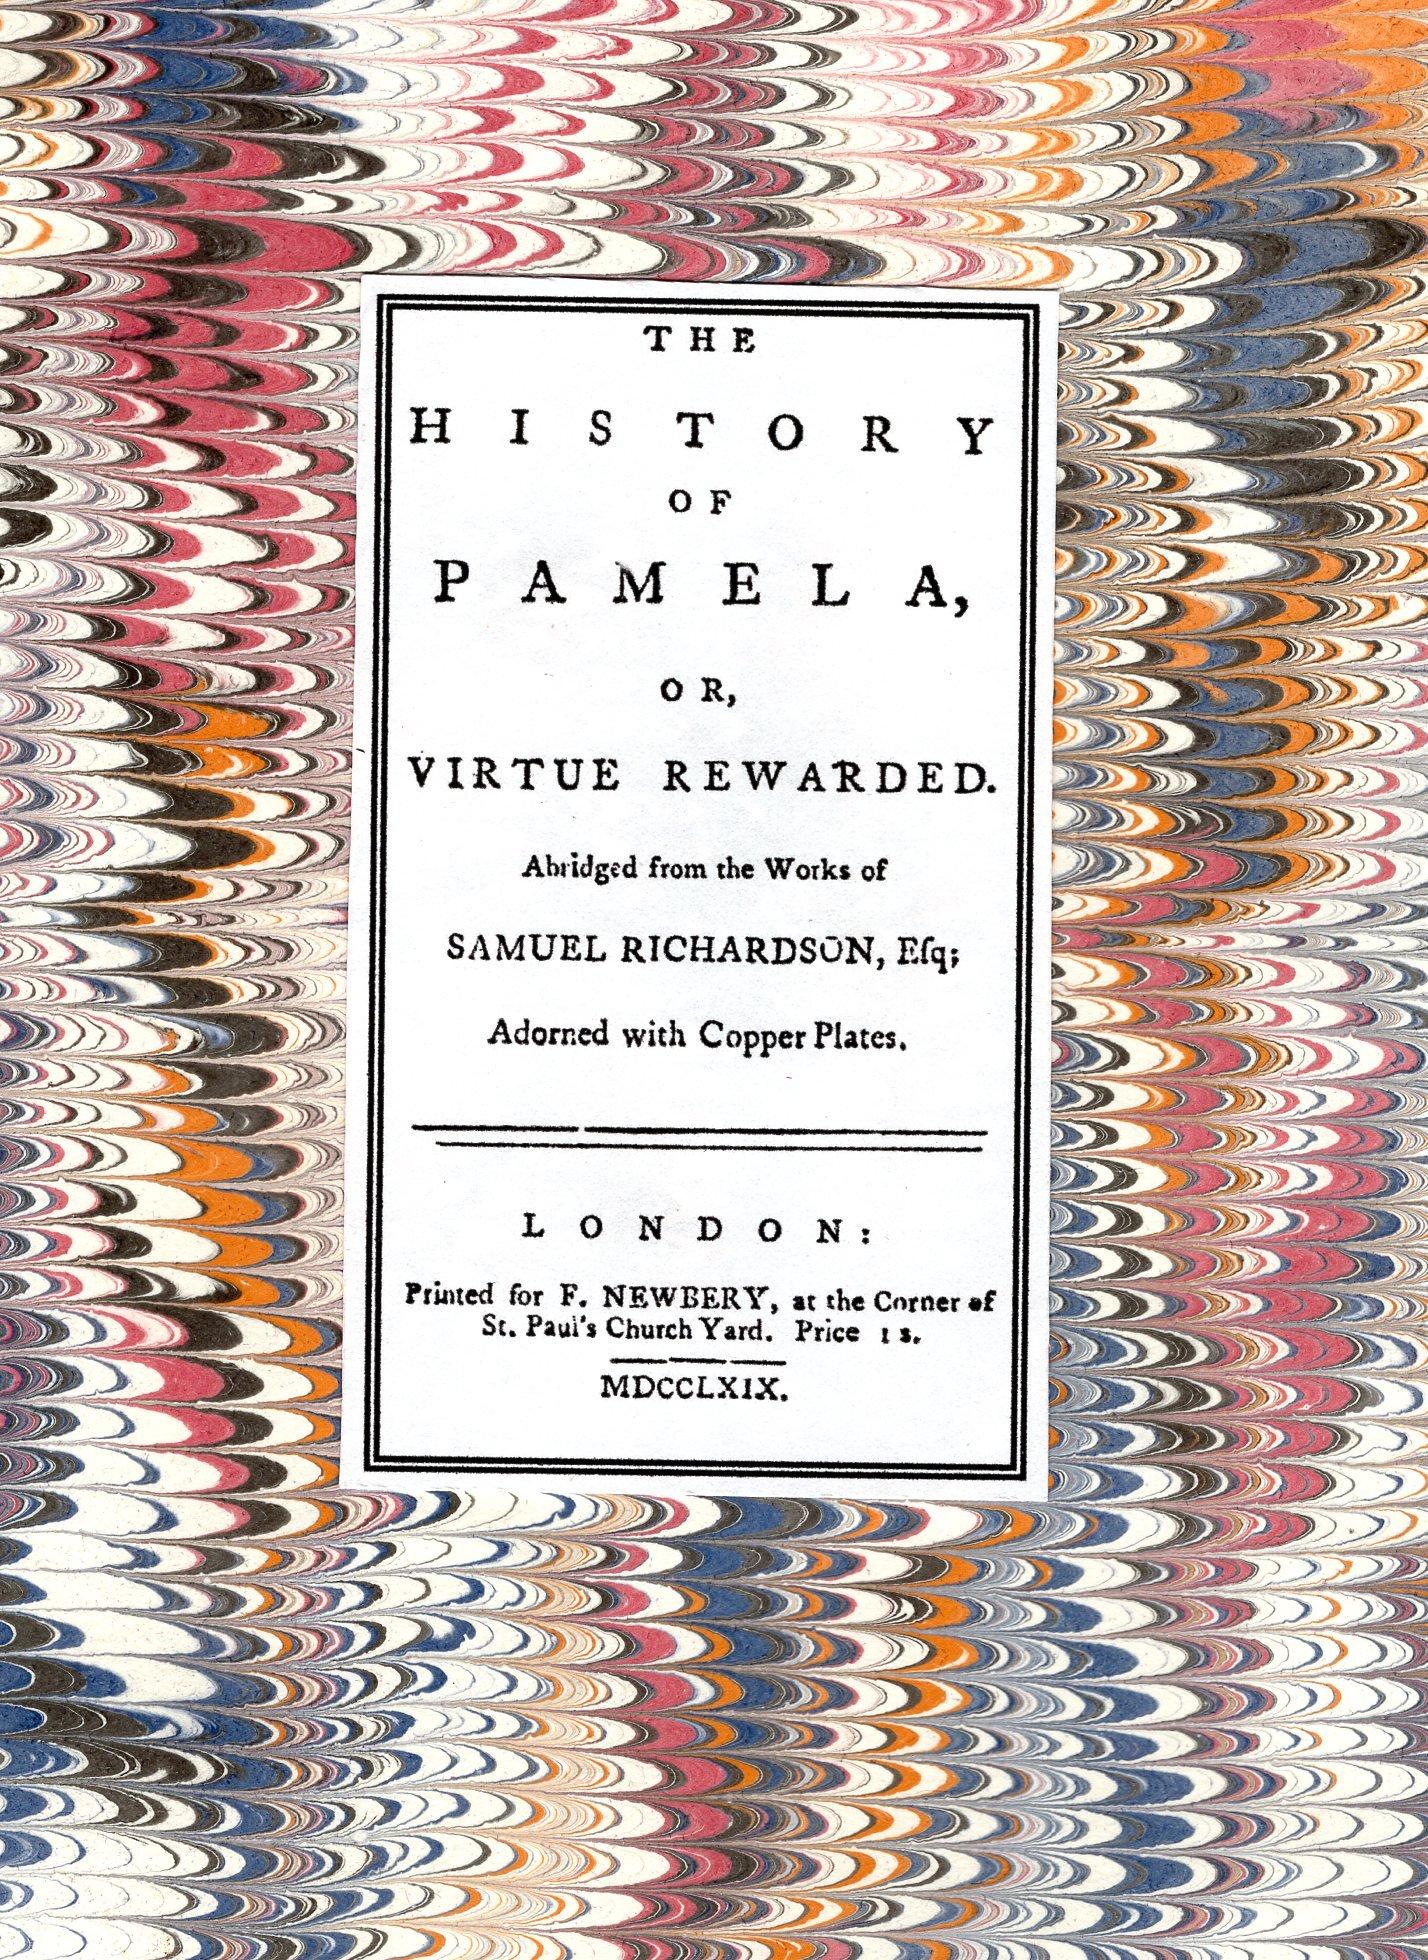 History of Pamela 1